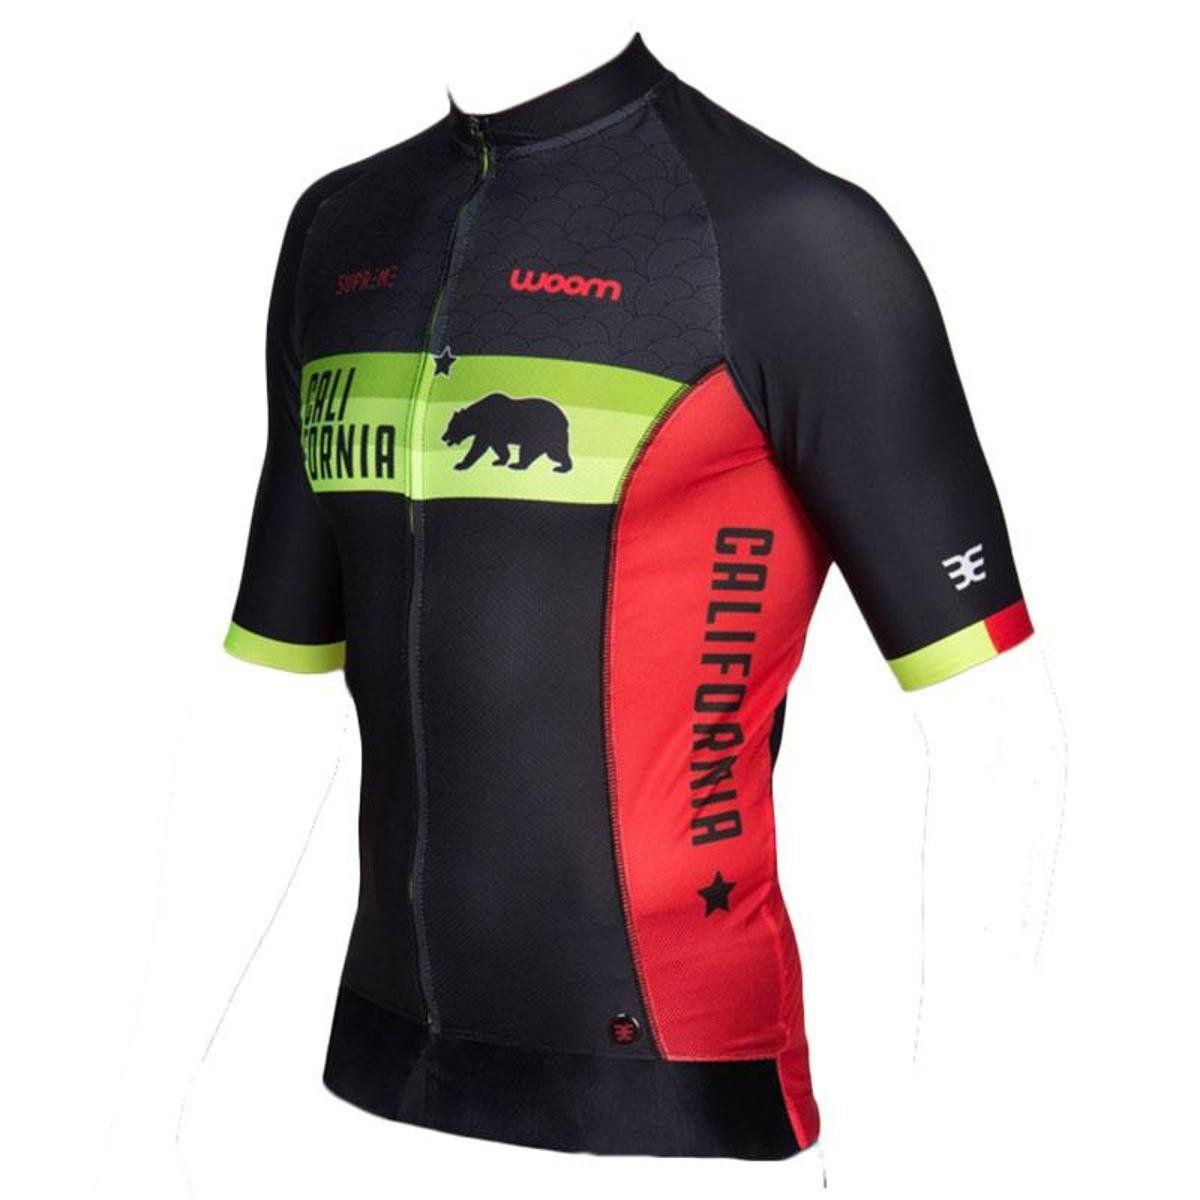 Camisa Ciclismo Supreme Woom California - Masc - 2019